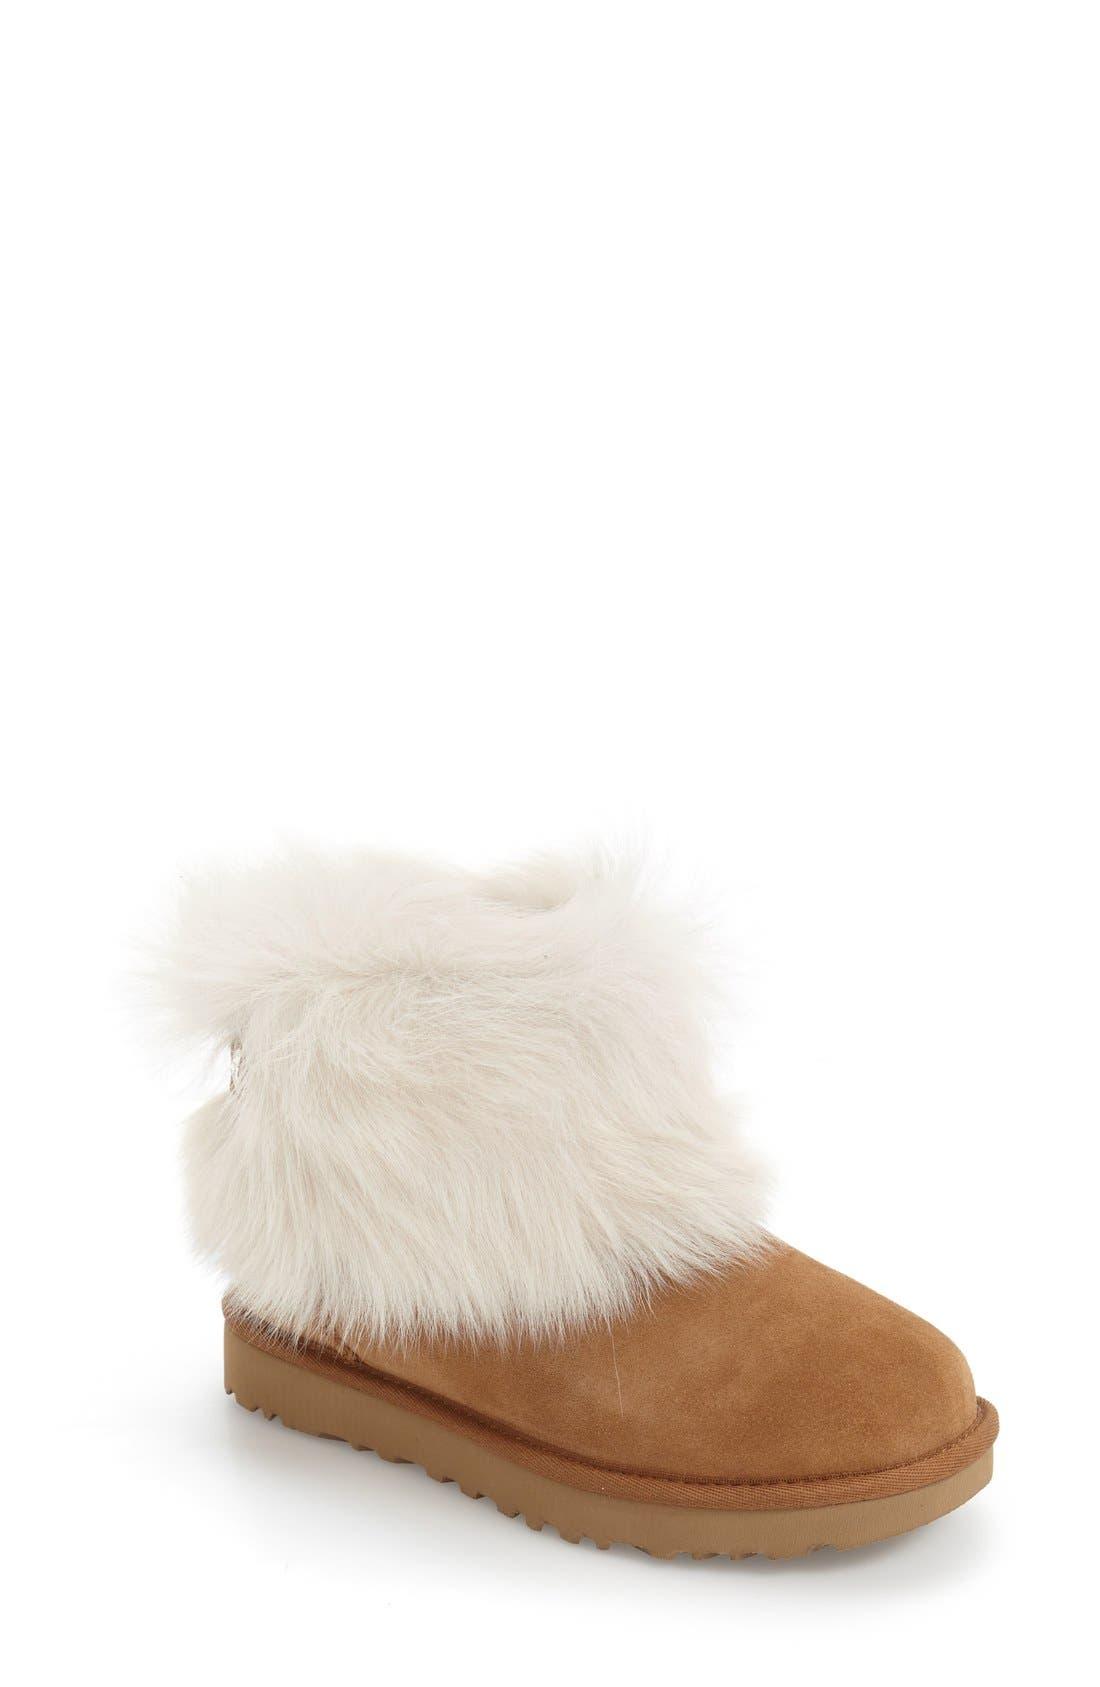 Main Image - UGG® 'Valentina' Genuine Shearling Cuff Boot (Women)